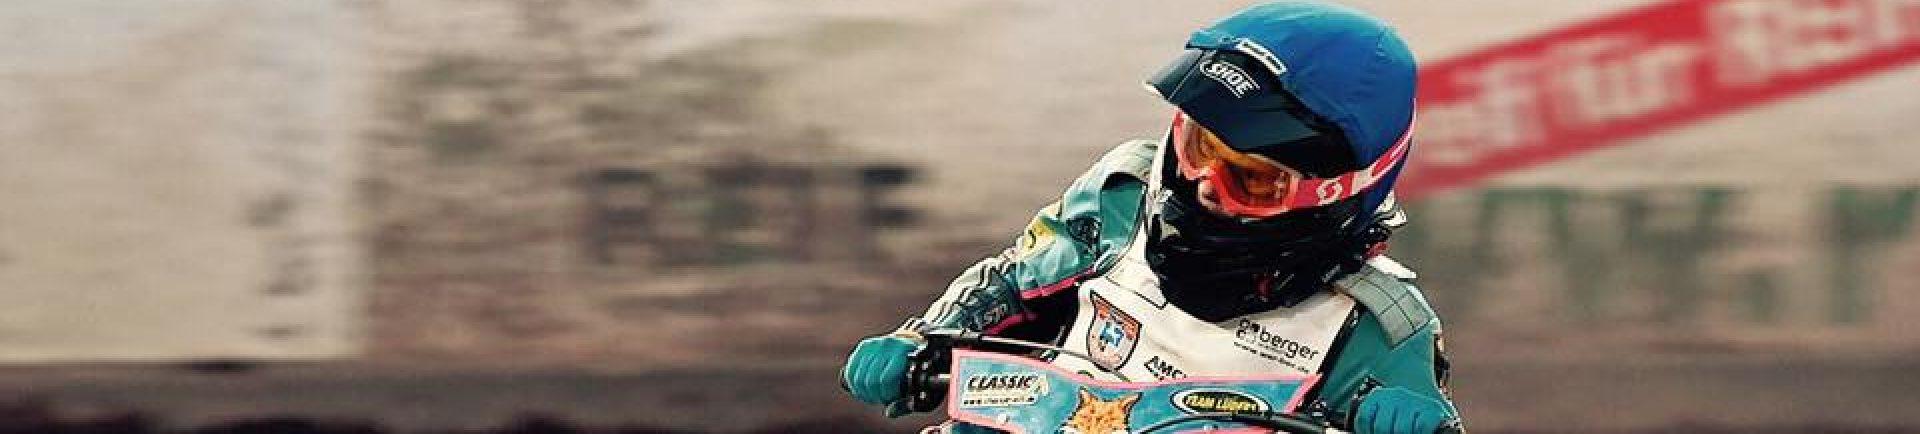 Speedwayracing Niels Oliver Wessel